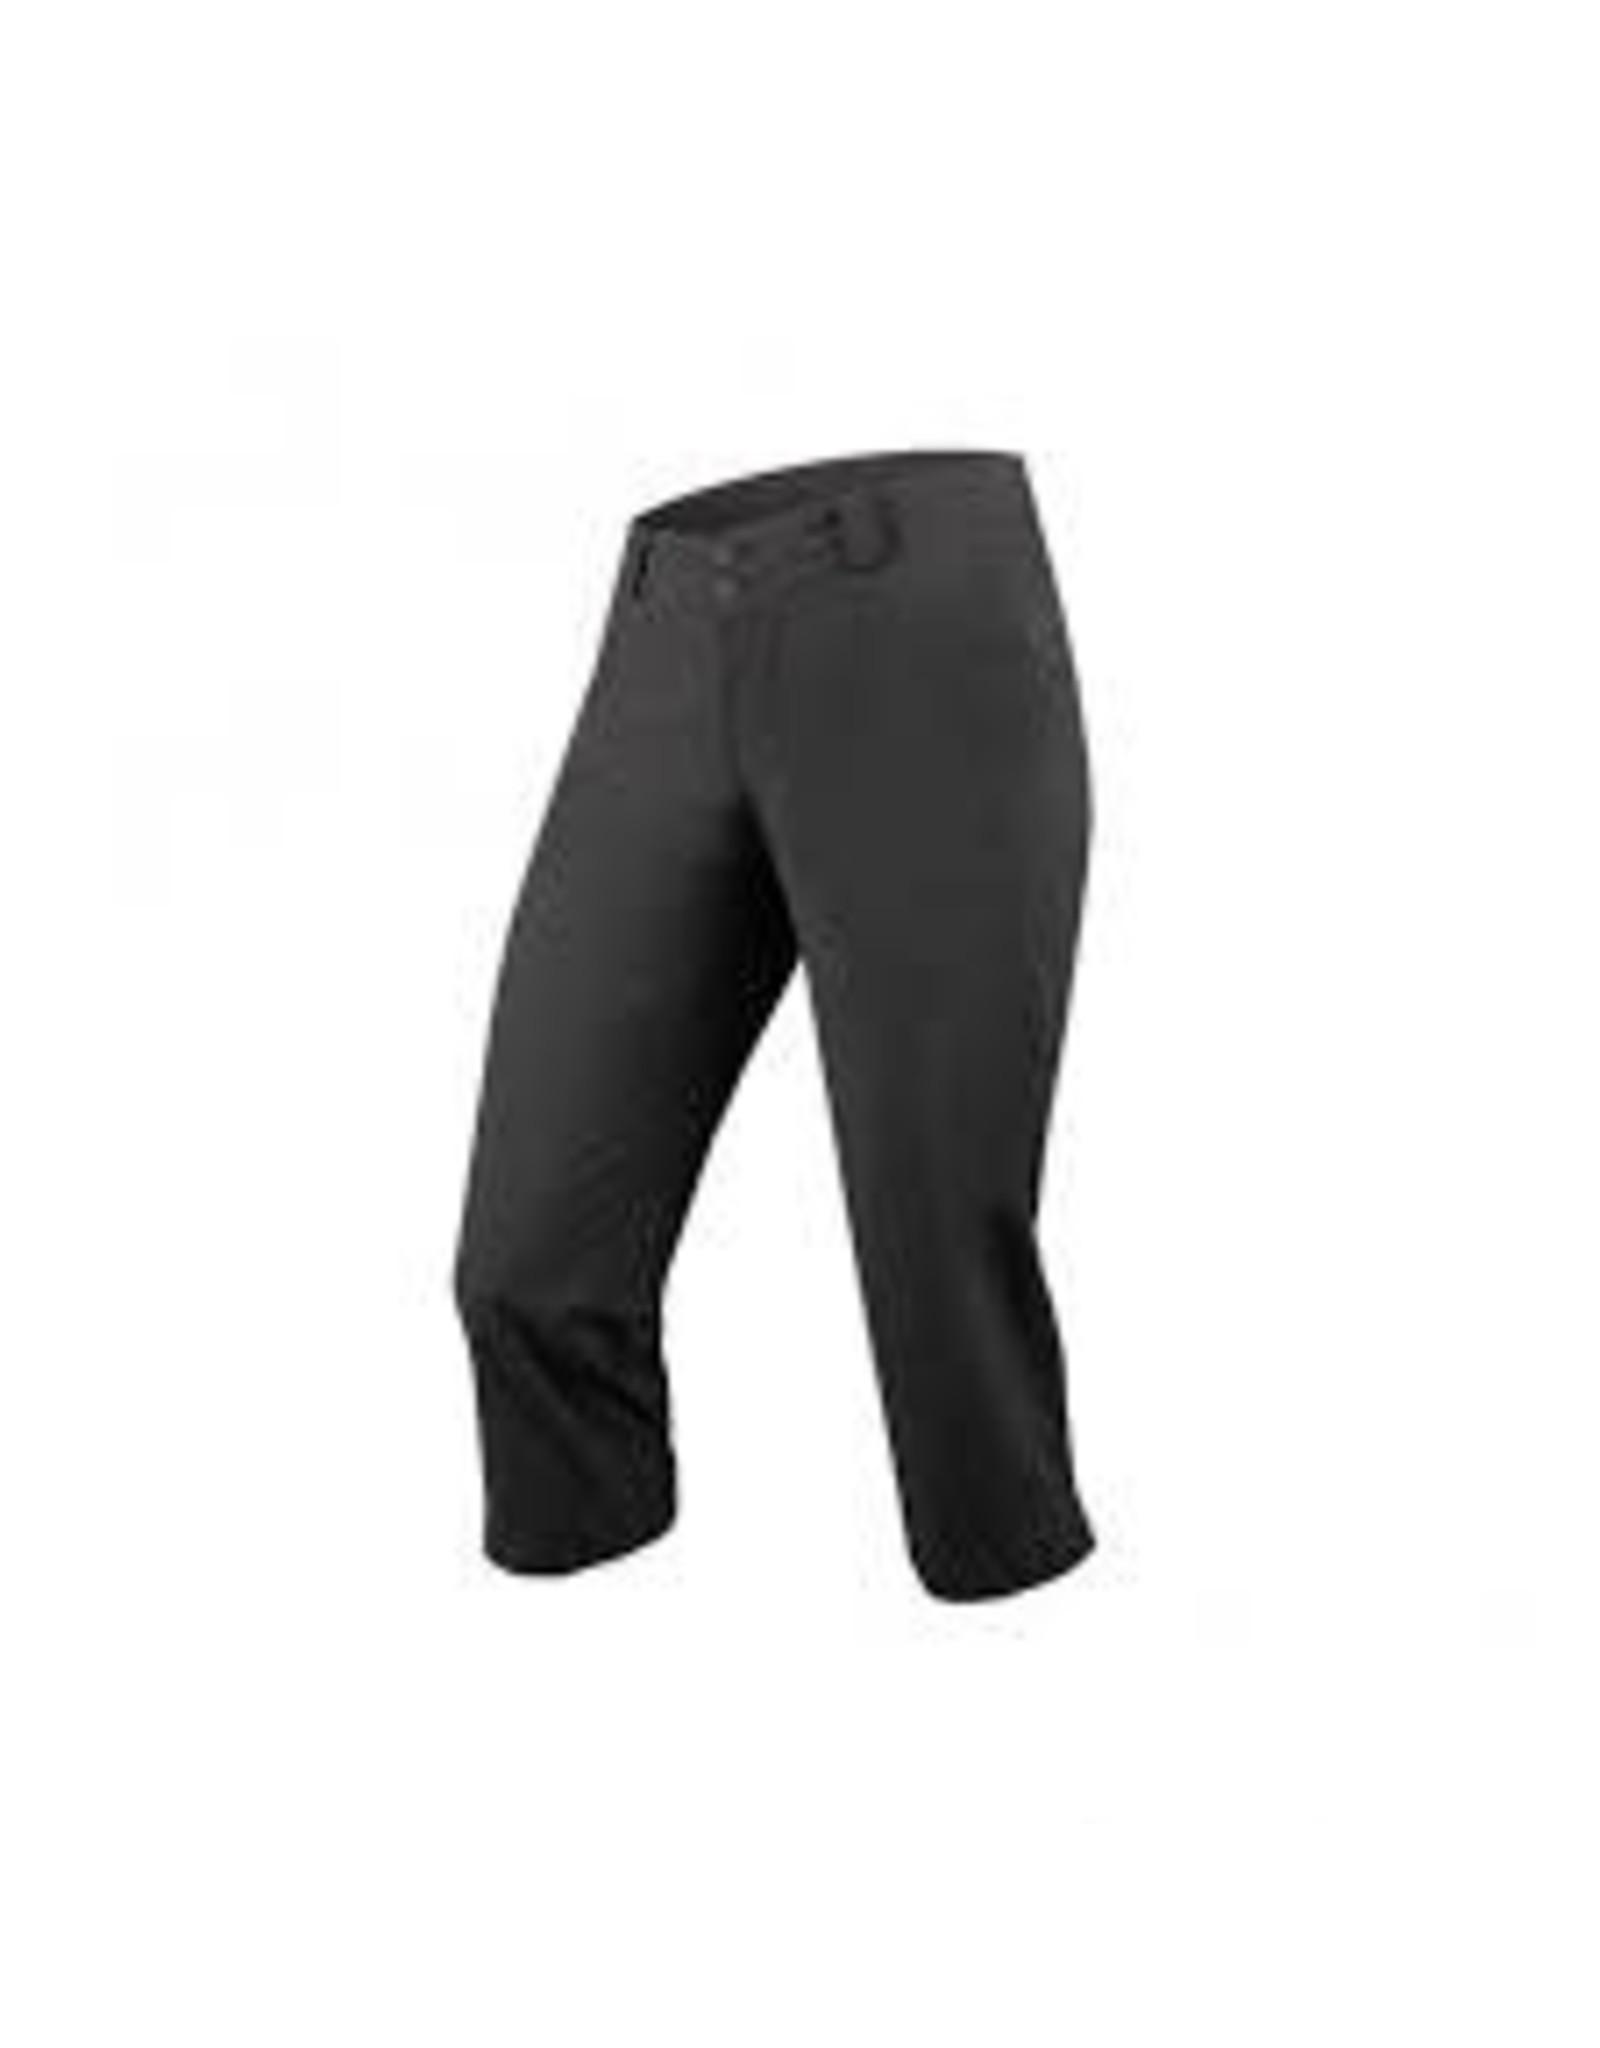 Endura Endura - Womens Trekkit 3/4 Shorts - L